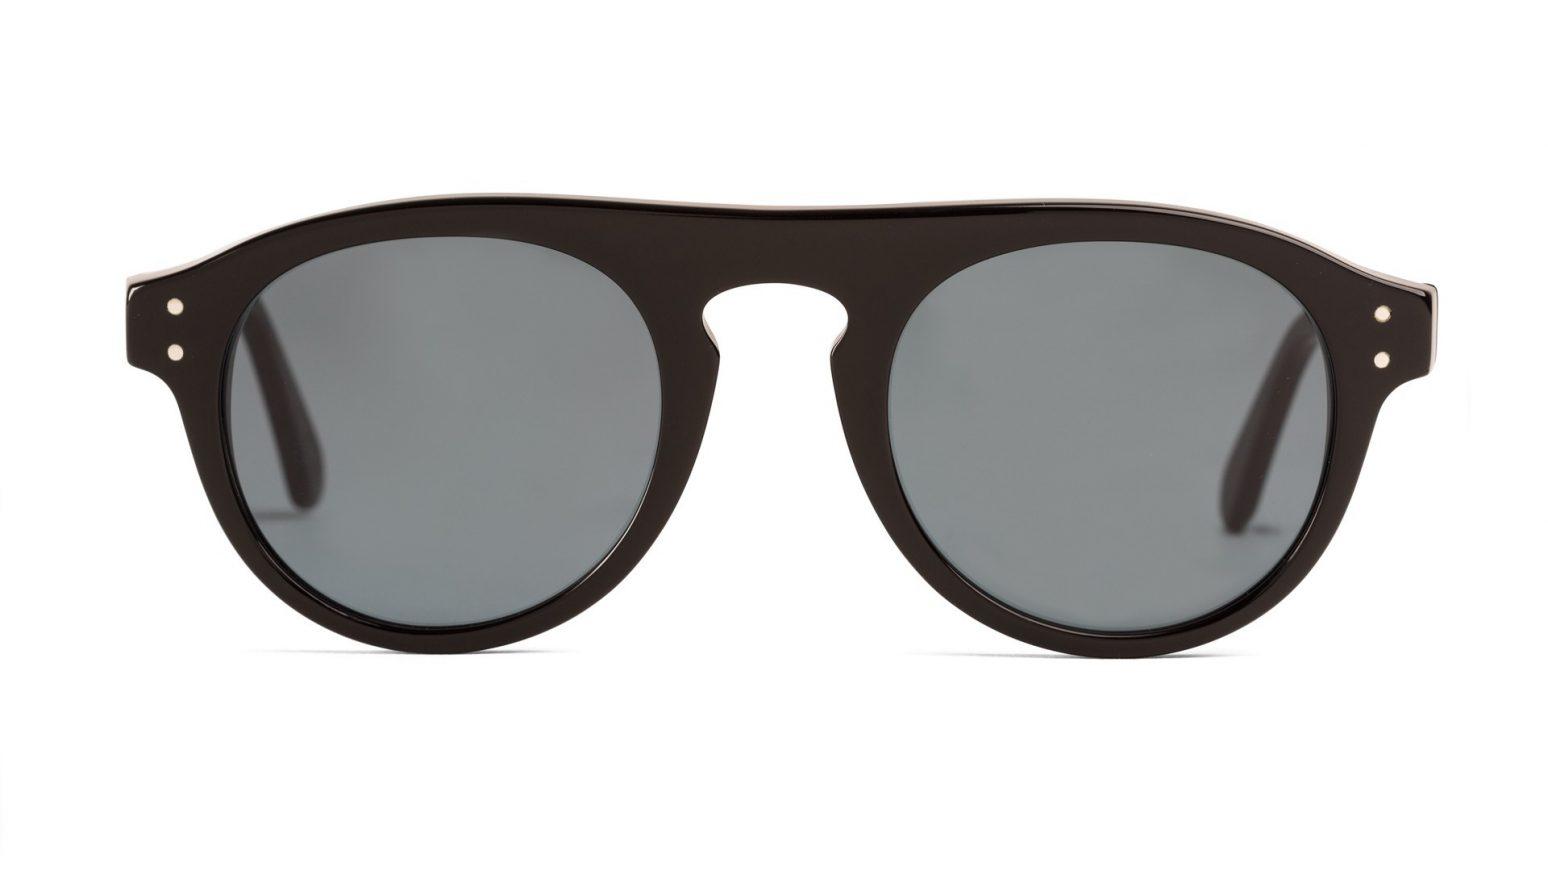 Sunglasses retro Raval eyewear - Óptica Gran Vía Barcelona